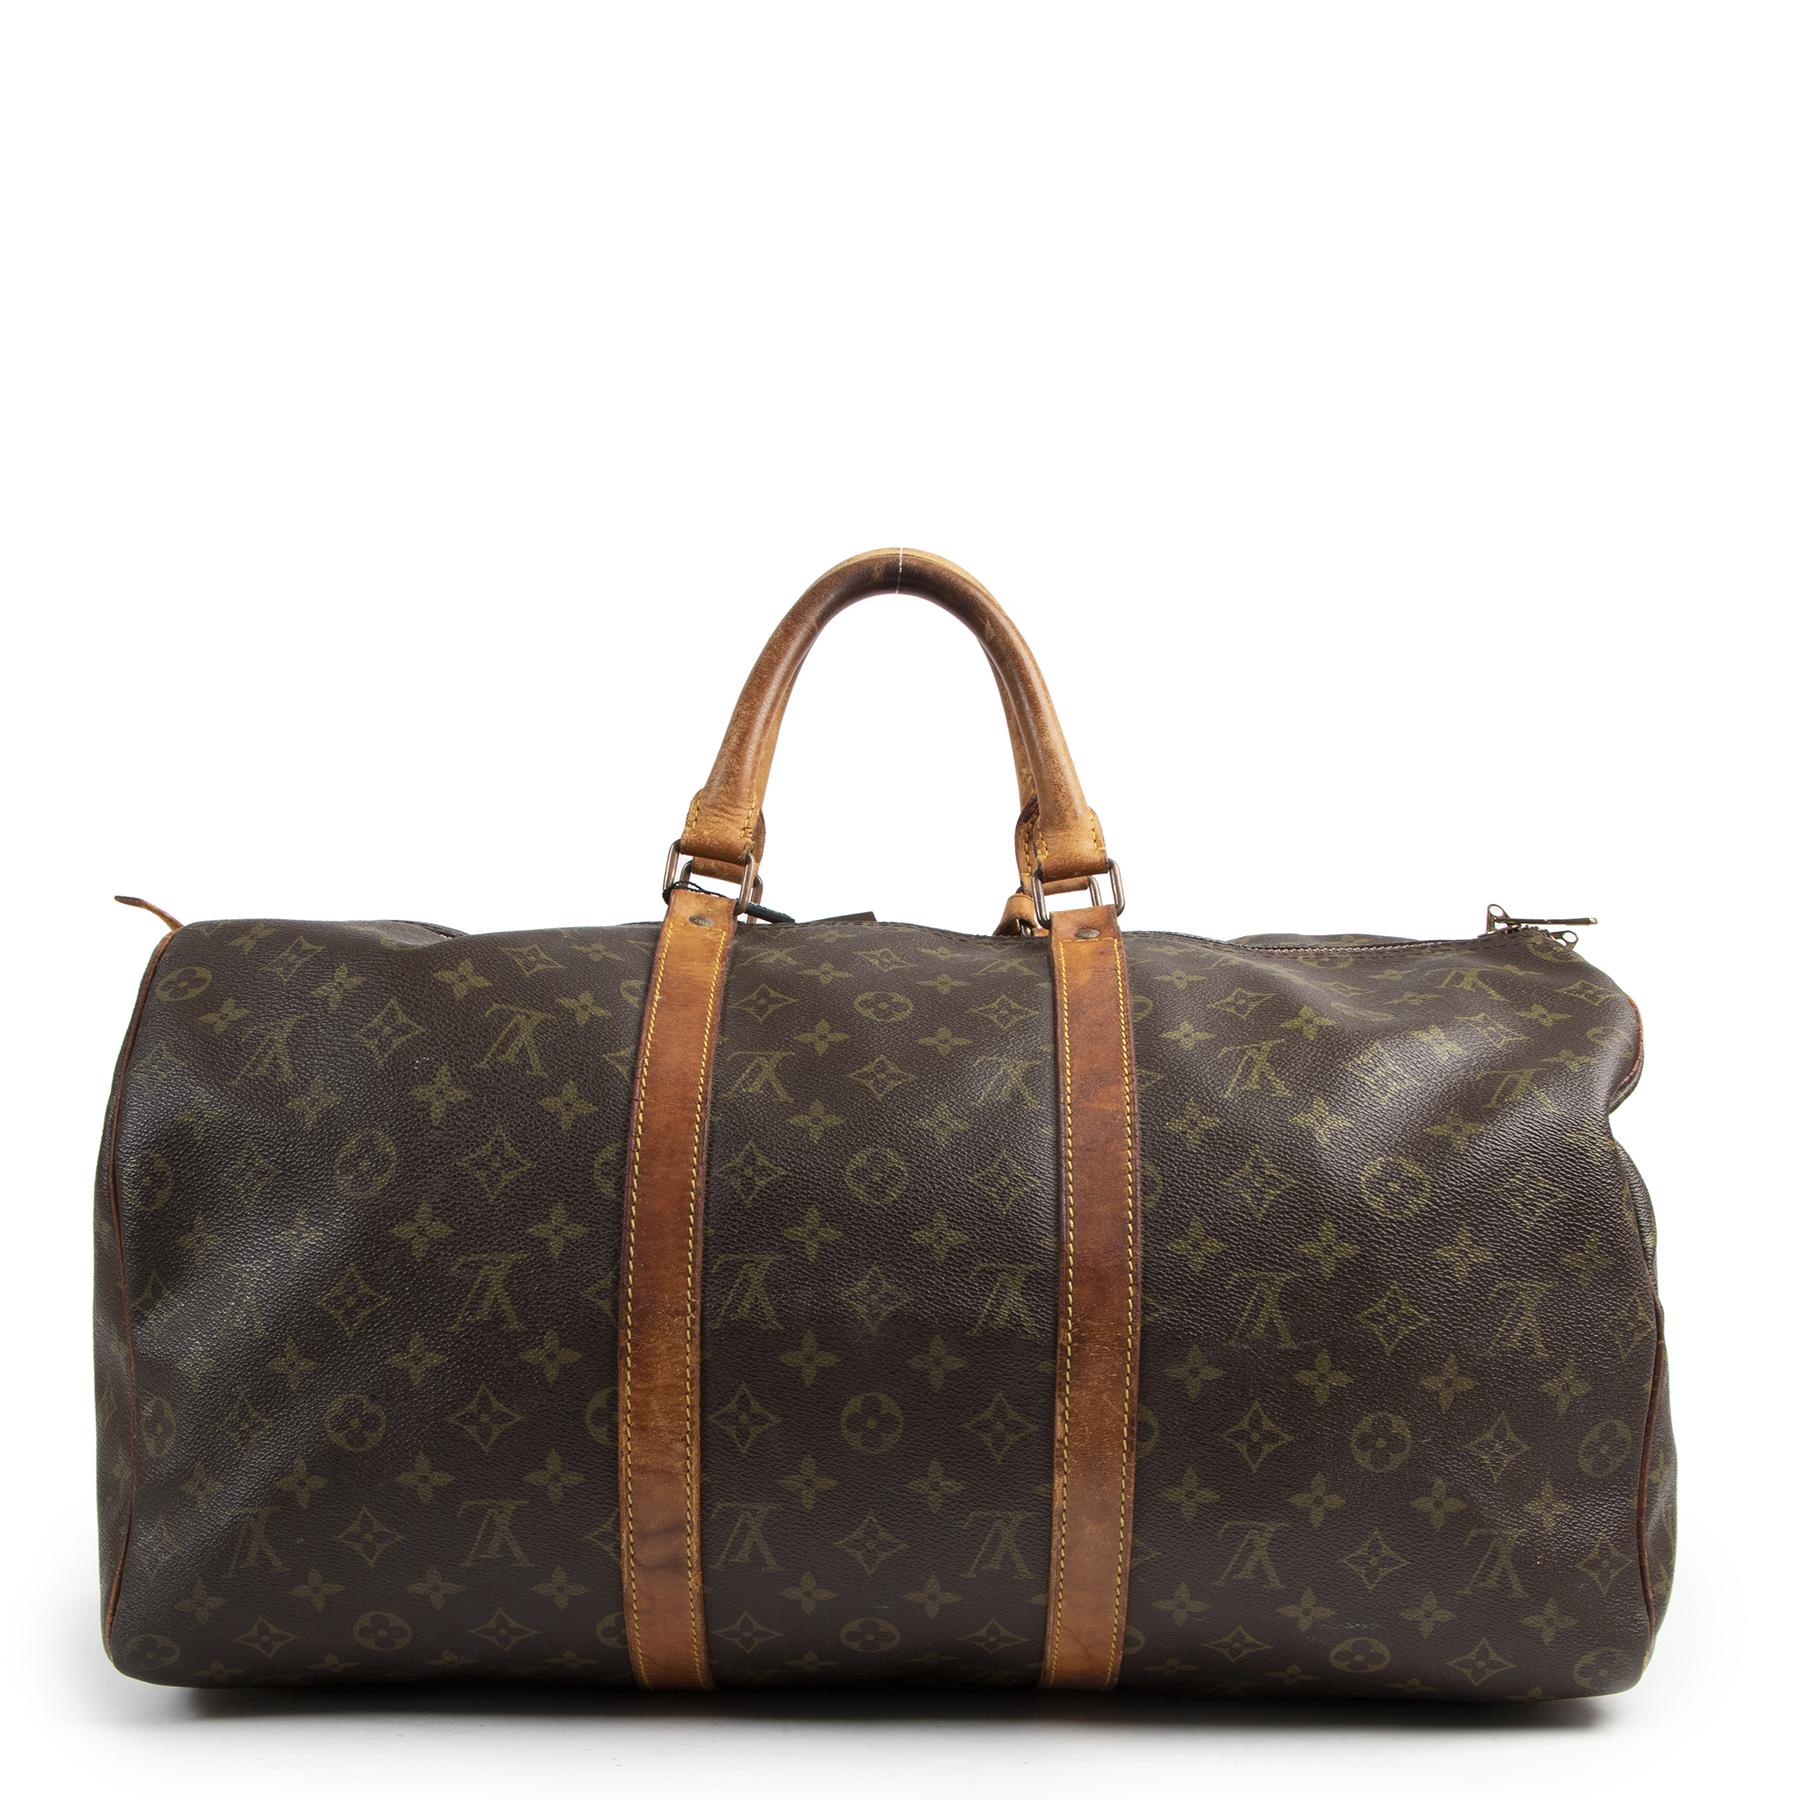 Authentic secondhand Louis Vuitton Monogram Keepall 50 Bag designer bags fashion luxury vintage webshop safe secure online shopping